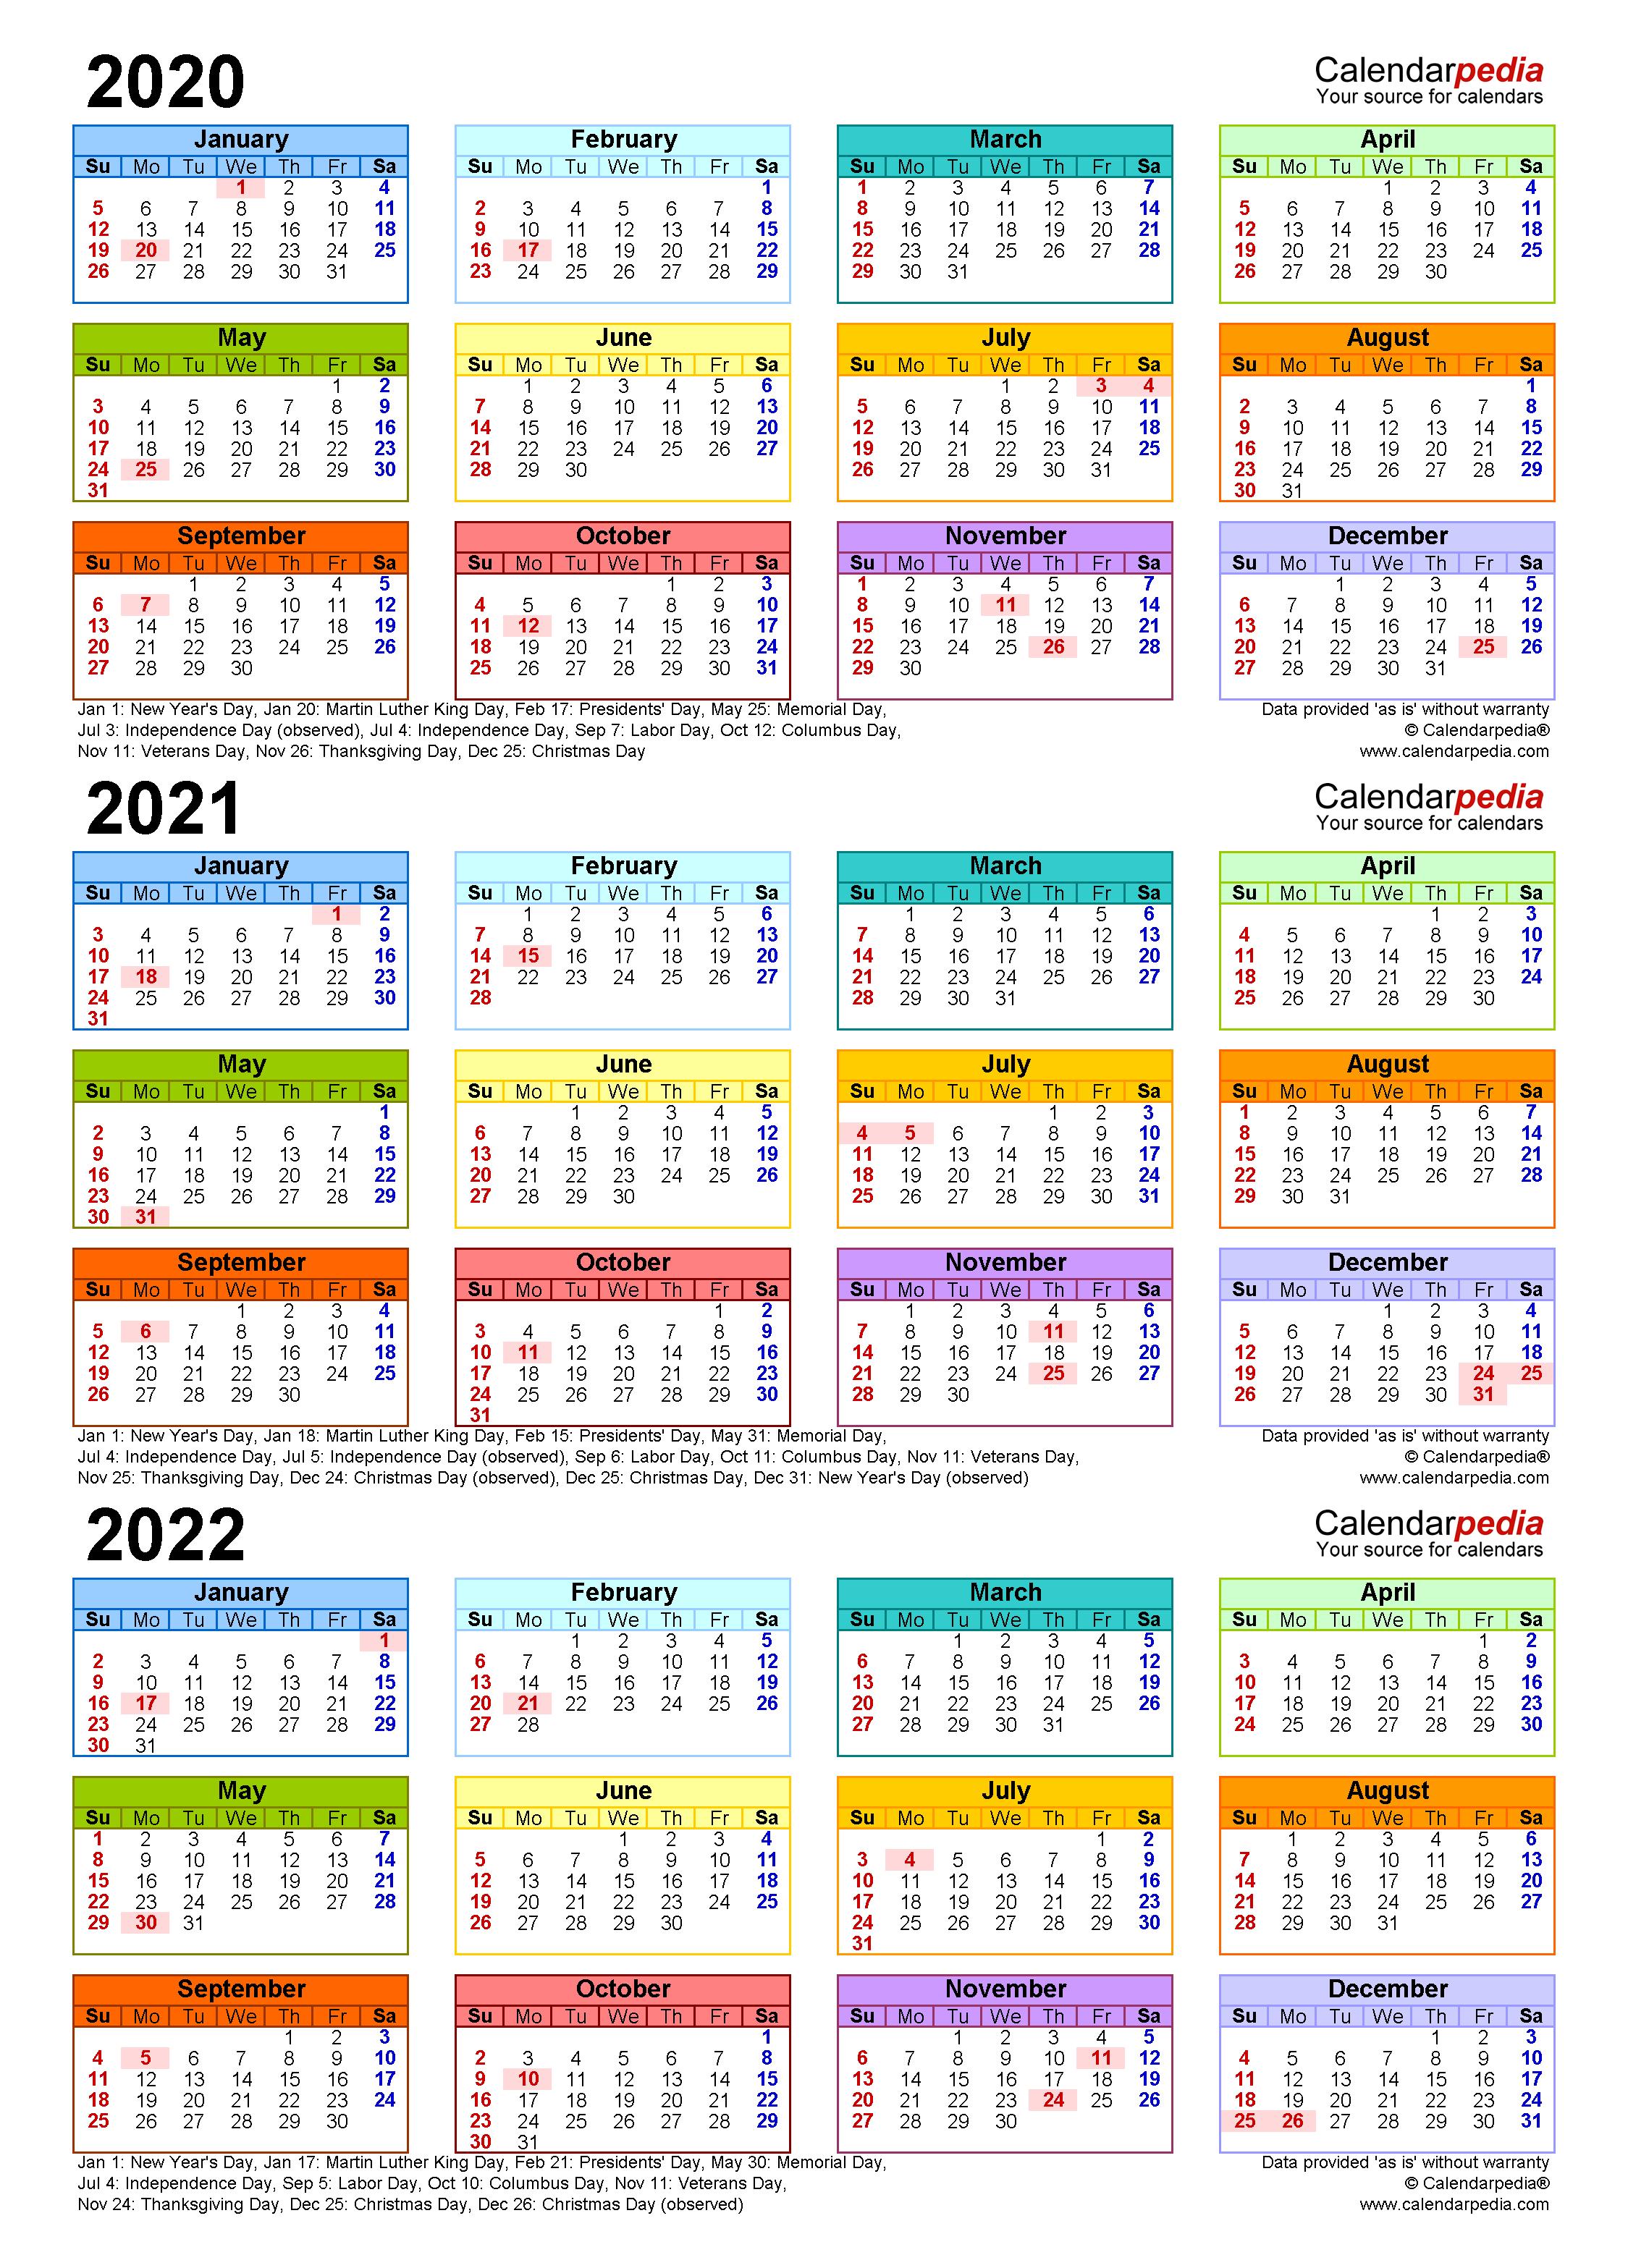 2020-2022 Three Year Calendar - Free Printable Pdf Templates pertaining to 3 Year Calendar 2020 To 2023